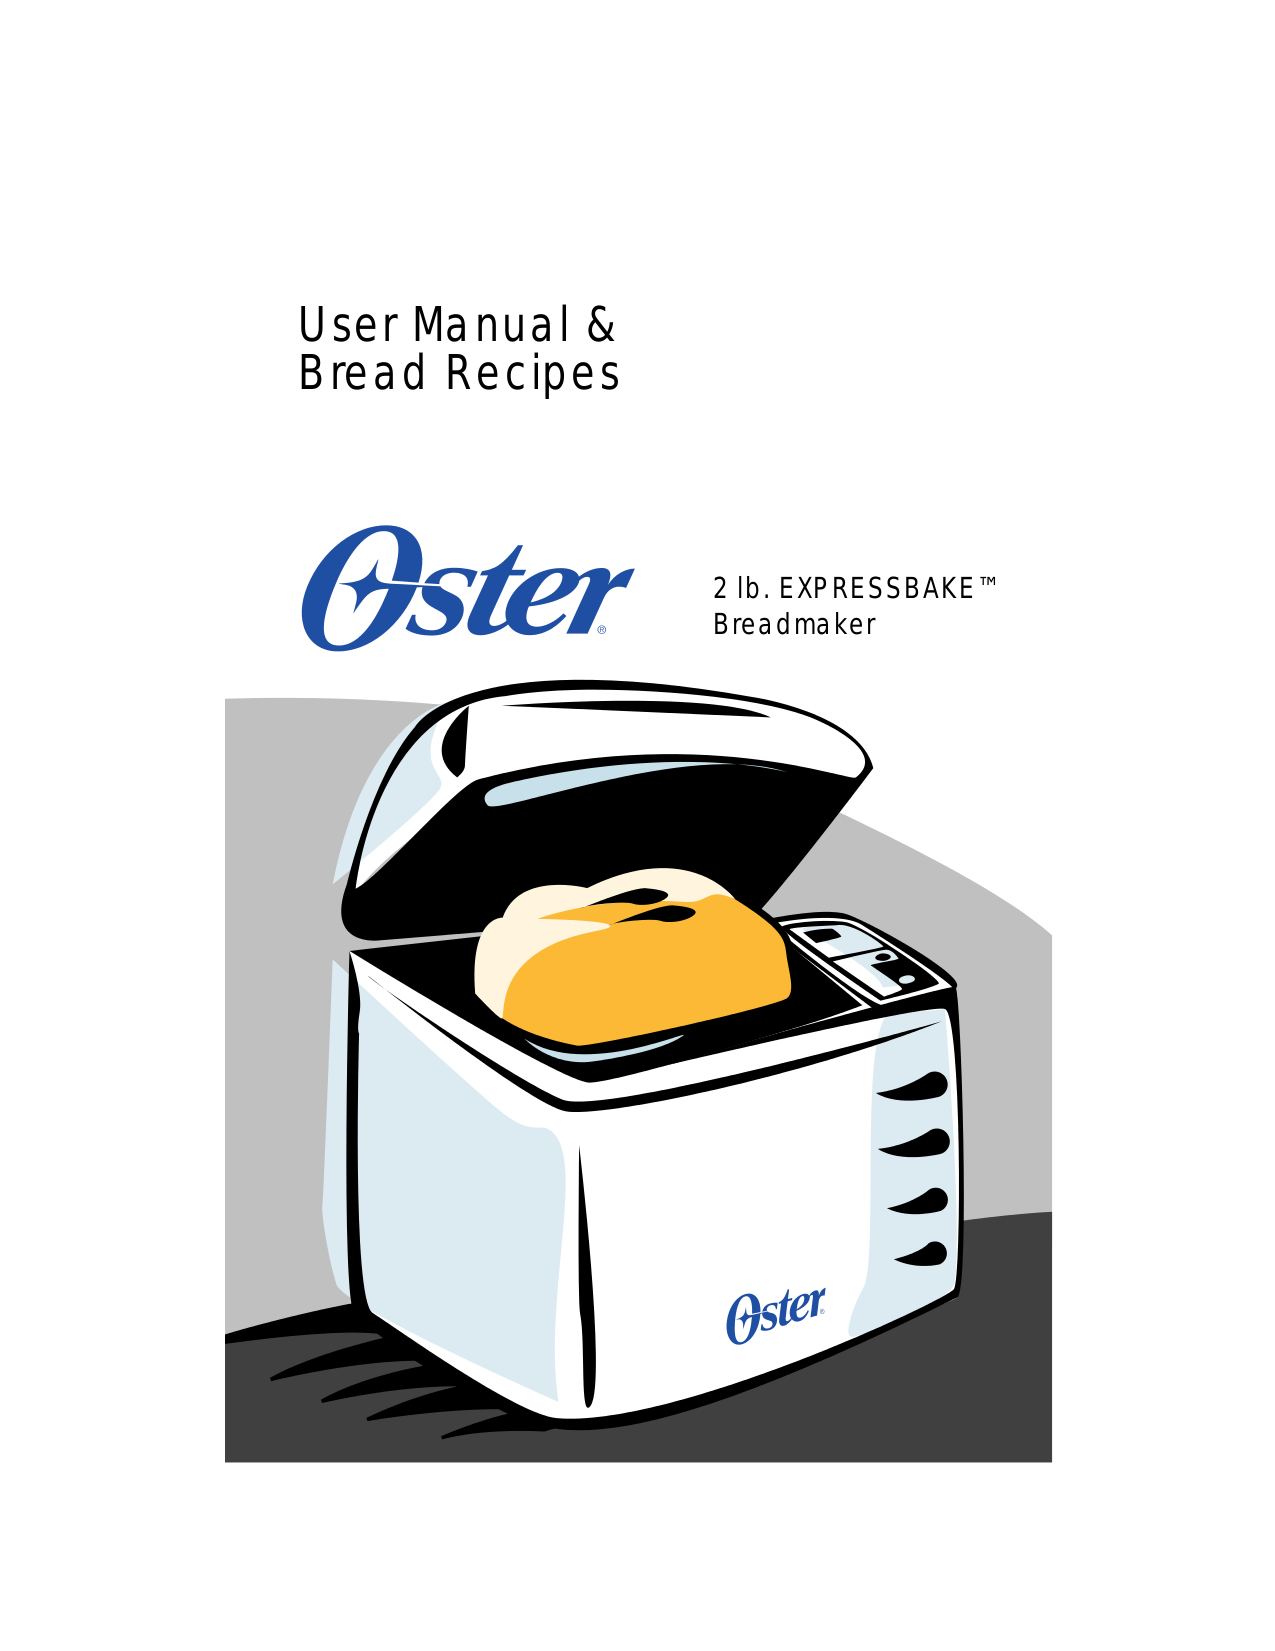 download free pdf for oster 5839 bread maker manual rh umlib com Oster 5838 Bread Maker Manual Oster Bread Maker Instruction Manual